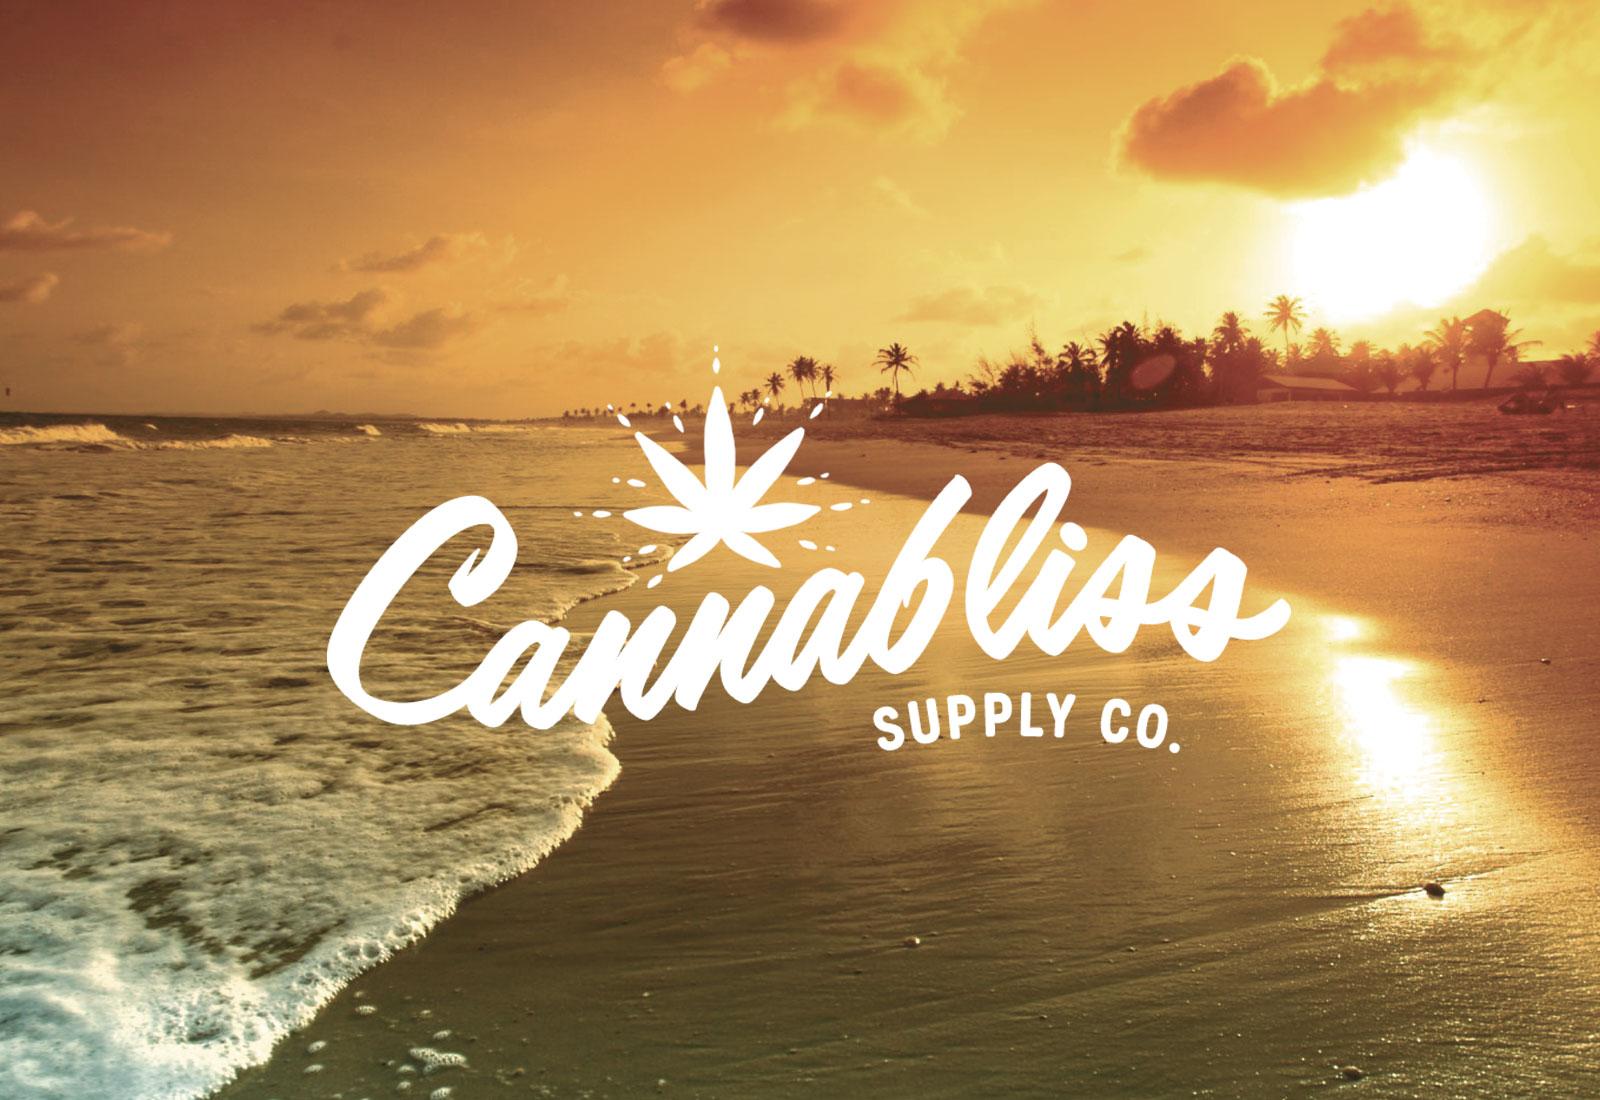 Cannabliss Dispensary Brand Mood